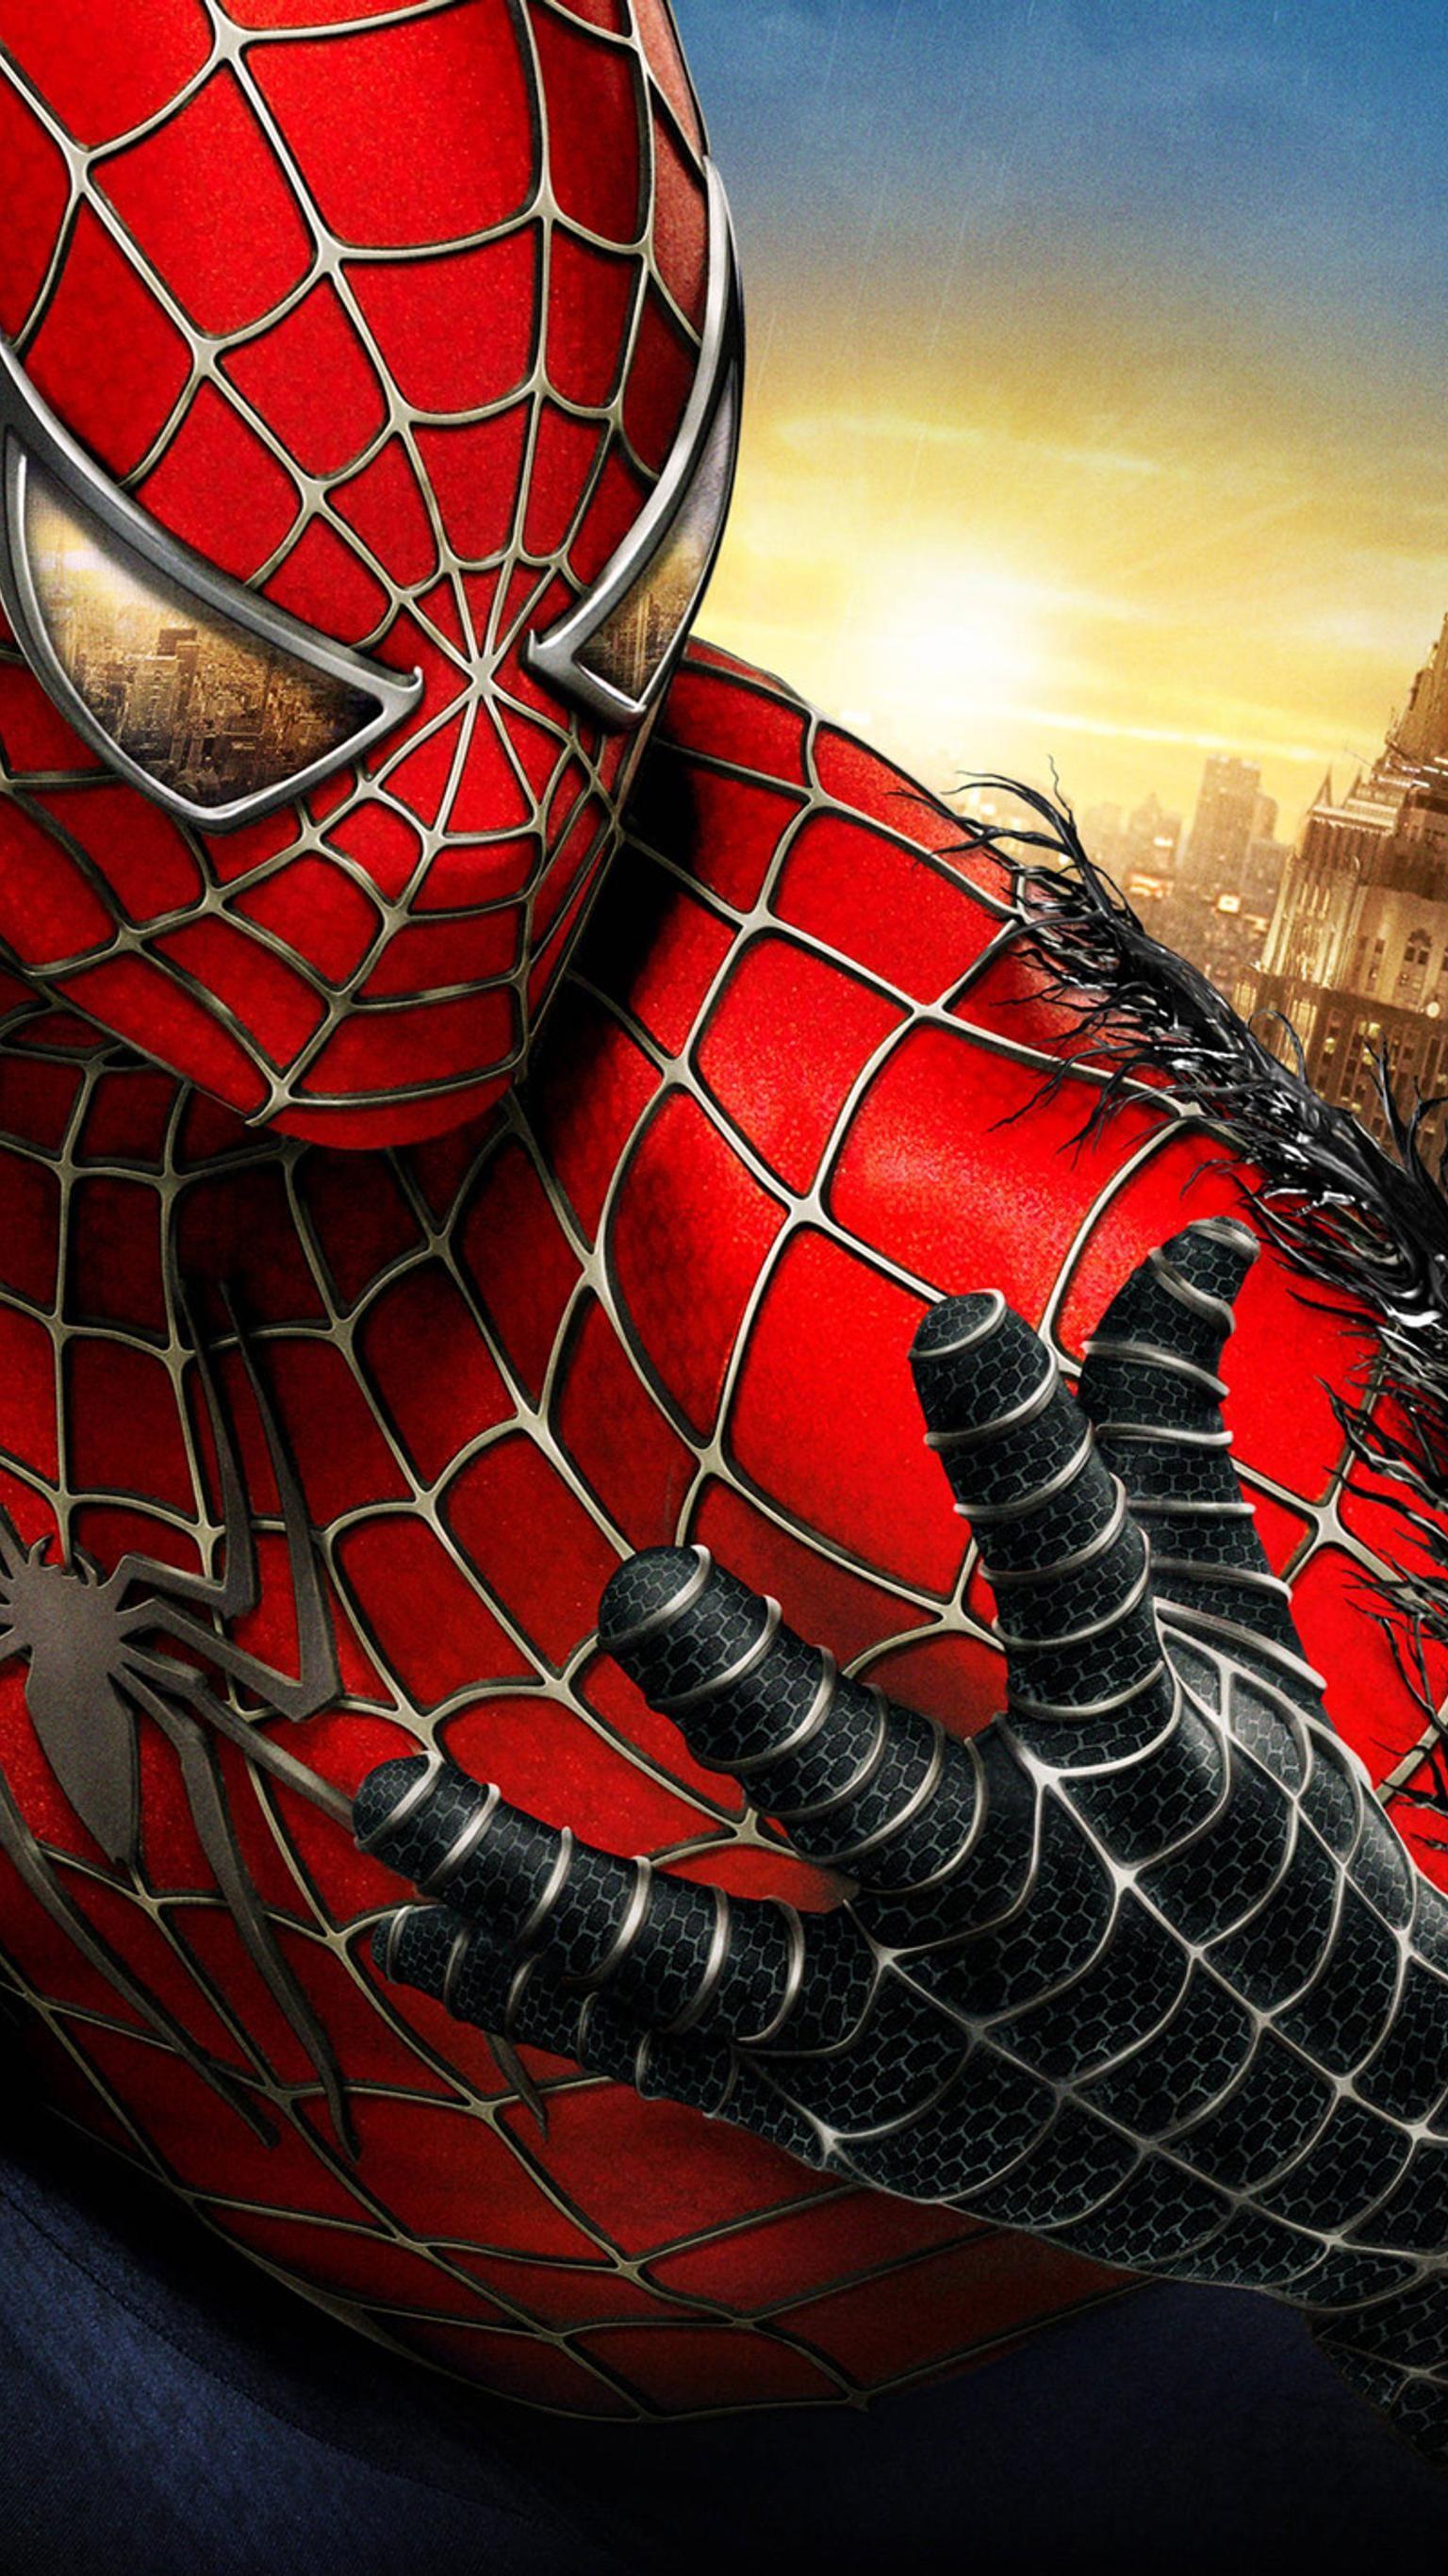 Spider Man 3 2007 Phone Wallpaper Moviemania Spiderman Pictures Spiderman Amazing Spiderman